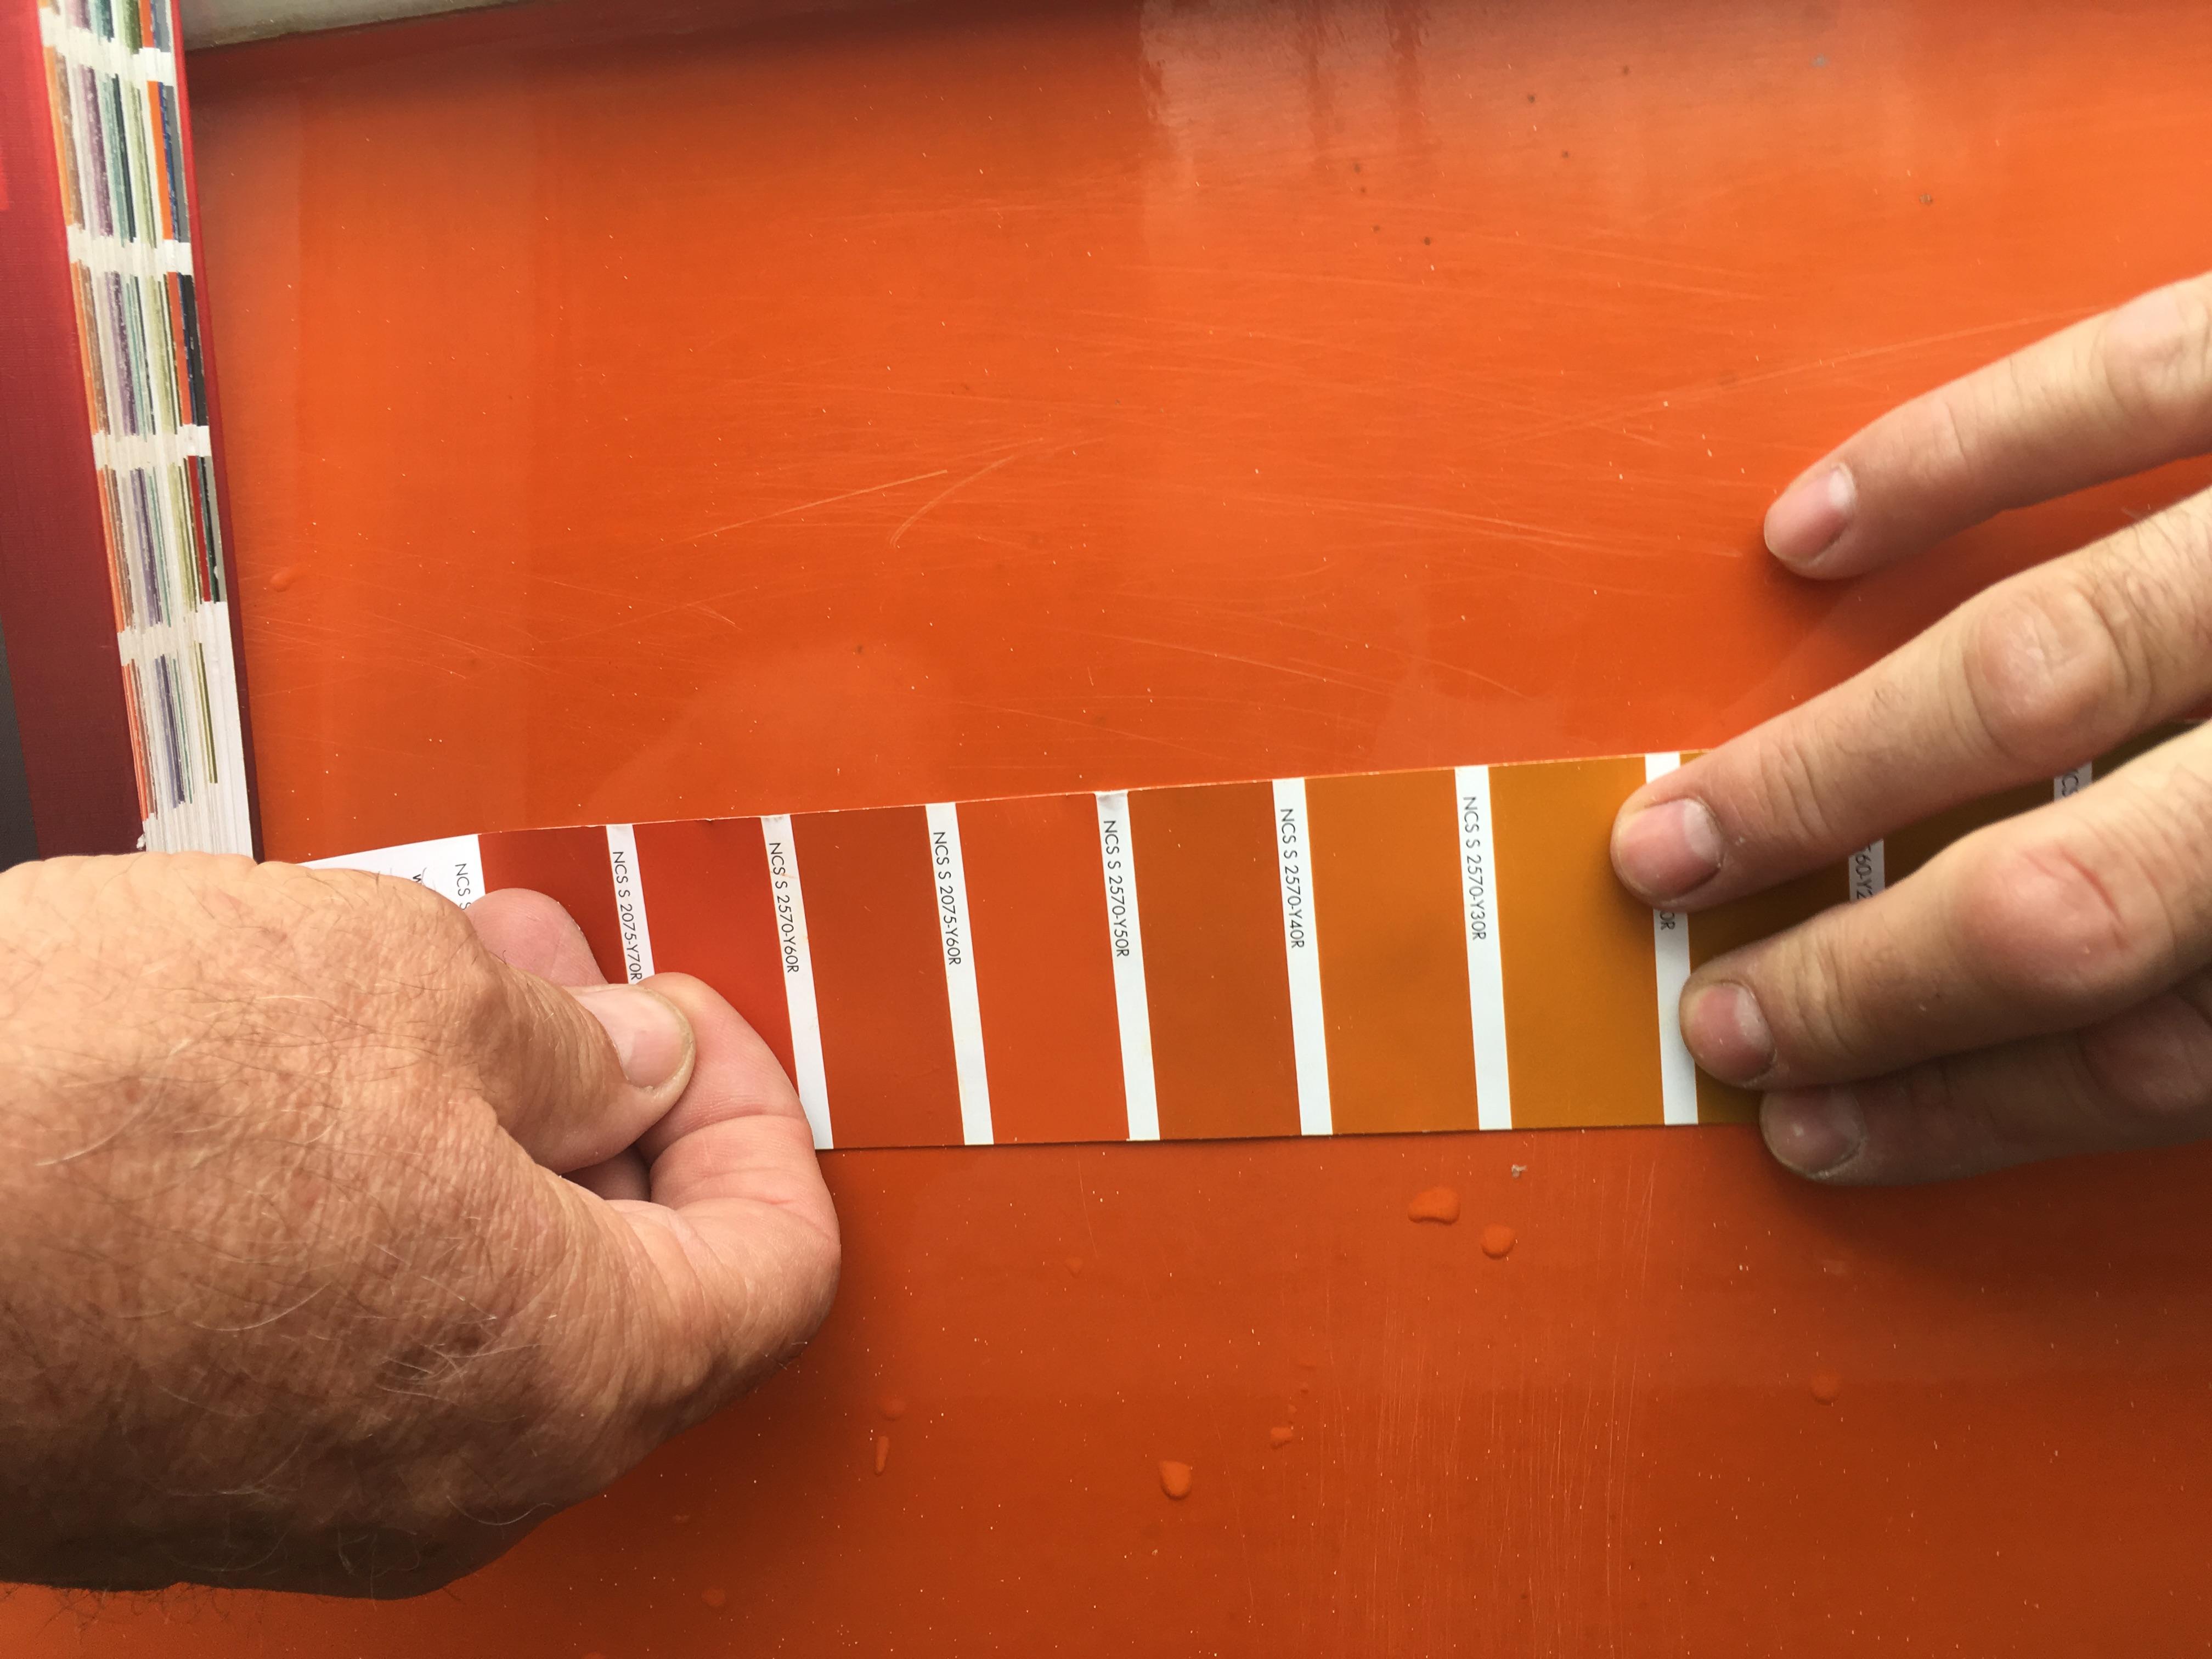 1977 Sangria GTE - Orange RAL Paint code? - 1977 Sangria GTE - Orange RAL Peinturez le code? IMG_9771